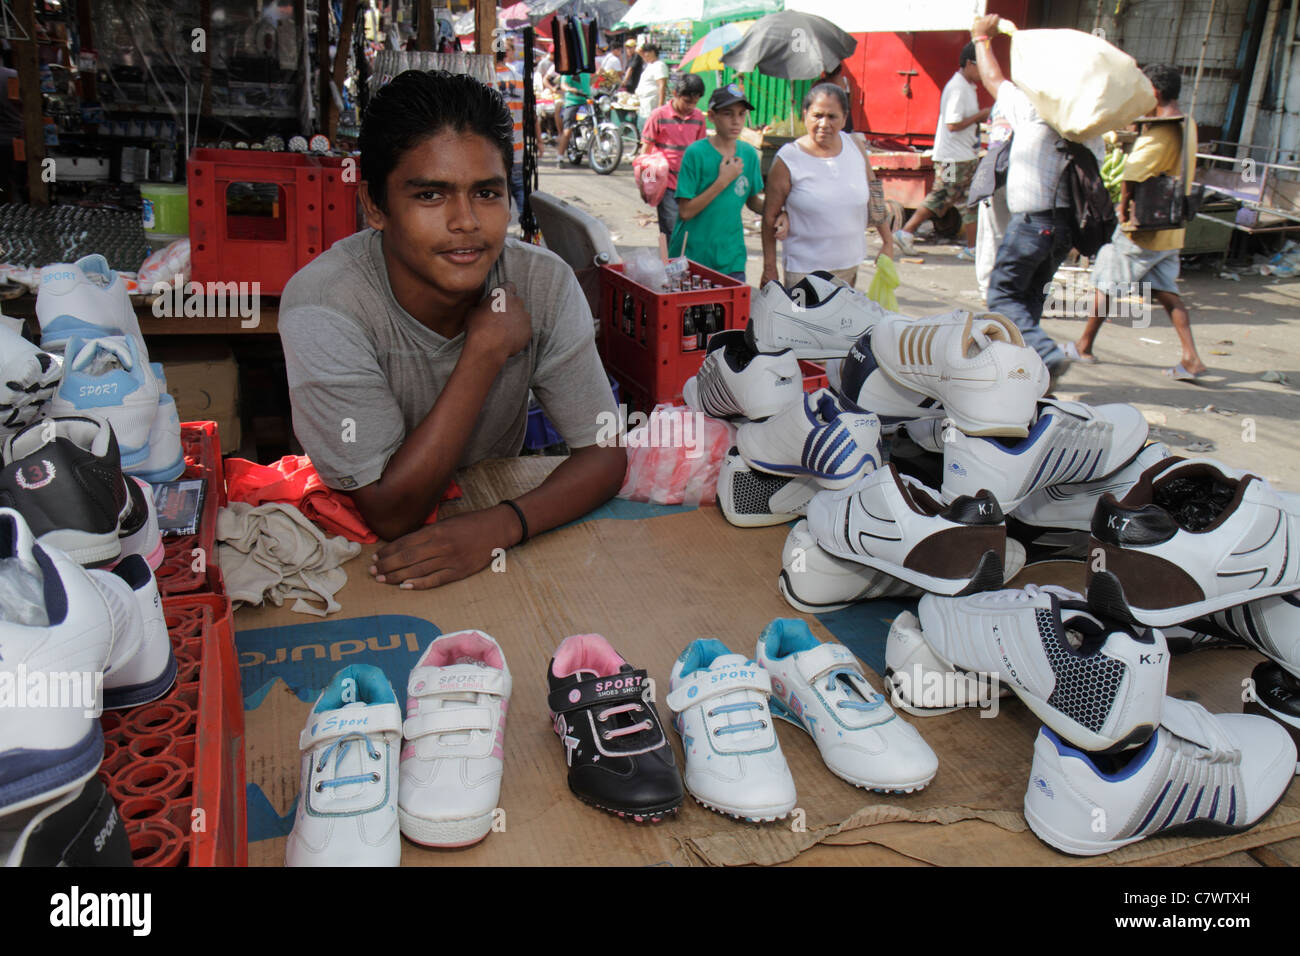 managua mercado oriental flea market marketplace managua mercado oriental flea market marketplace shopping shopper vendor stall hispanic boy teen job athletic